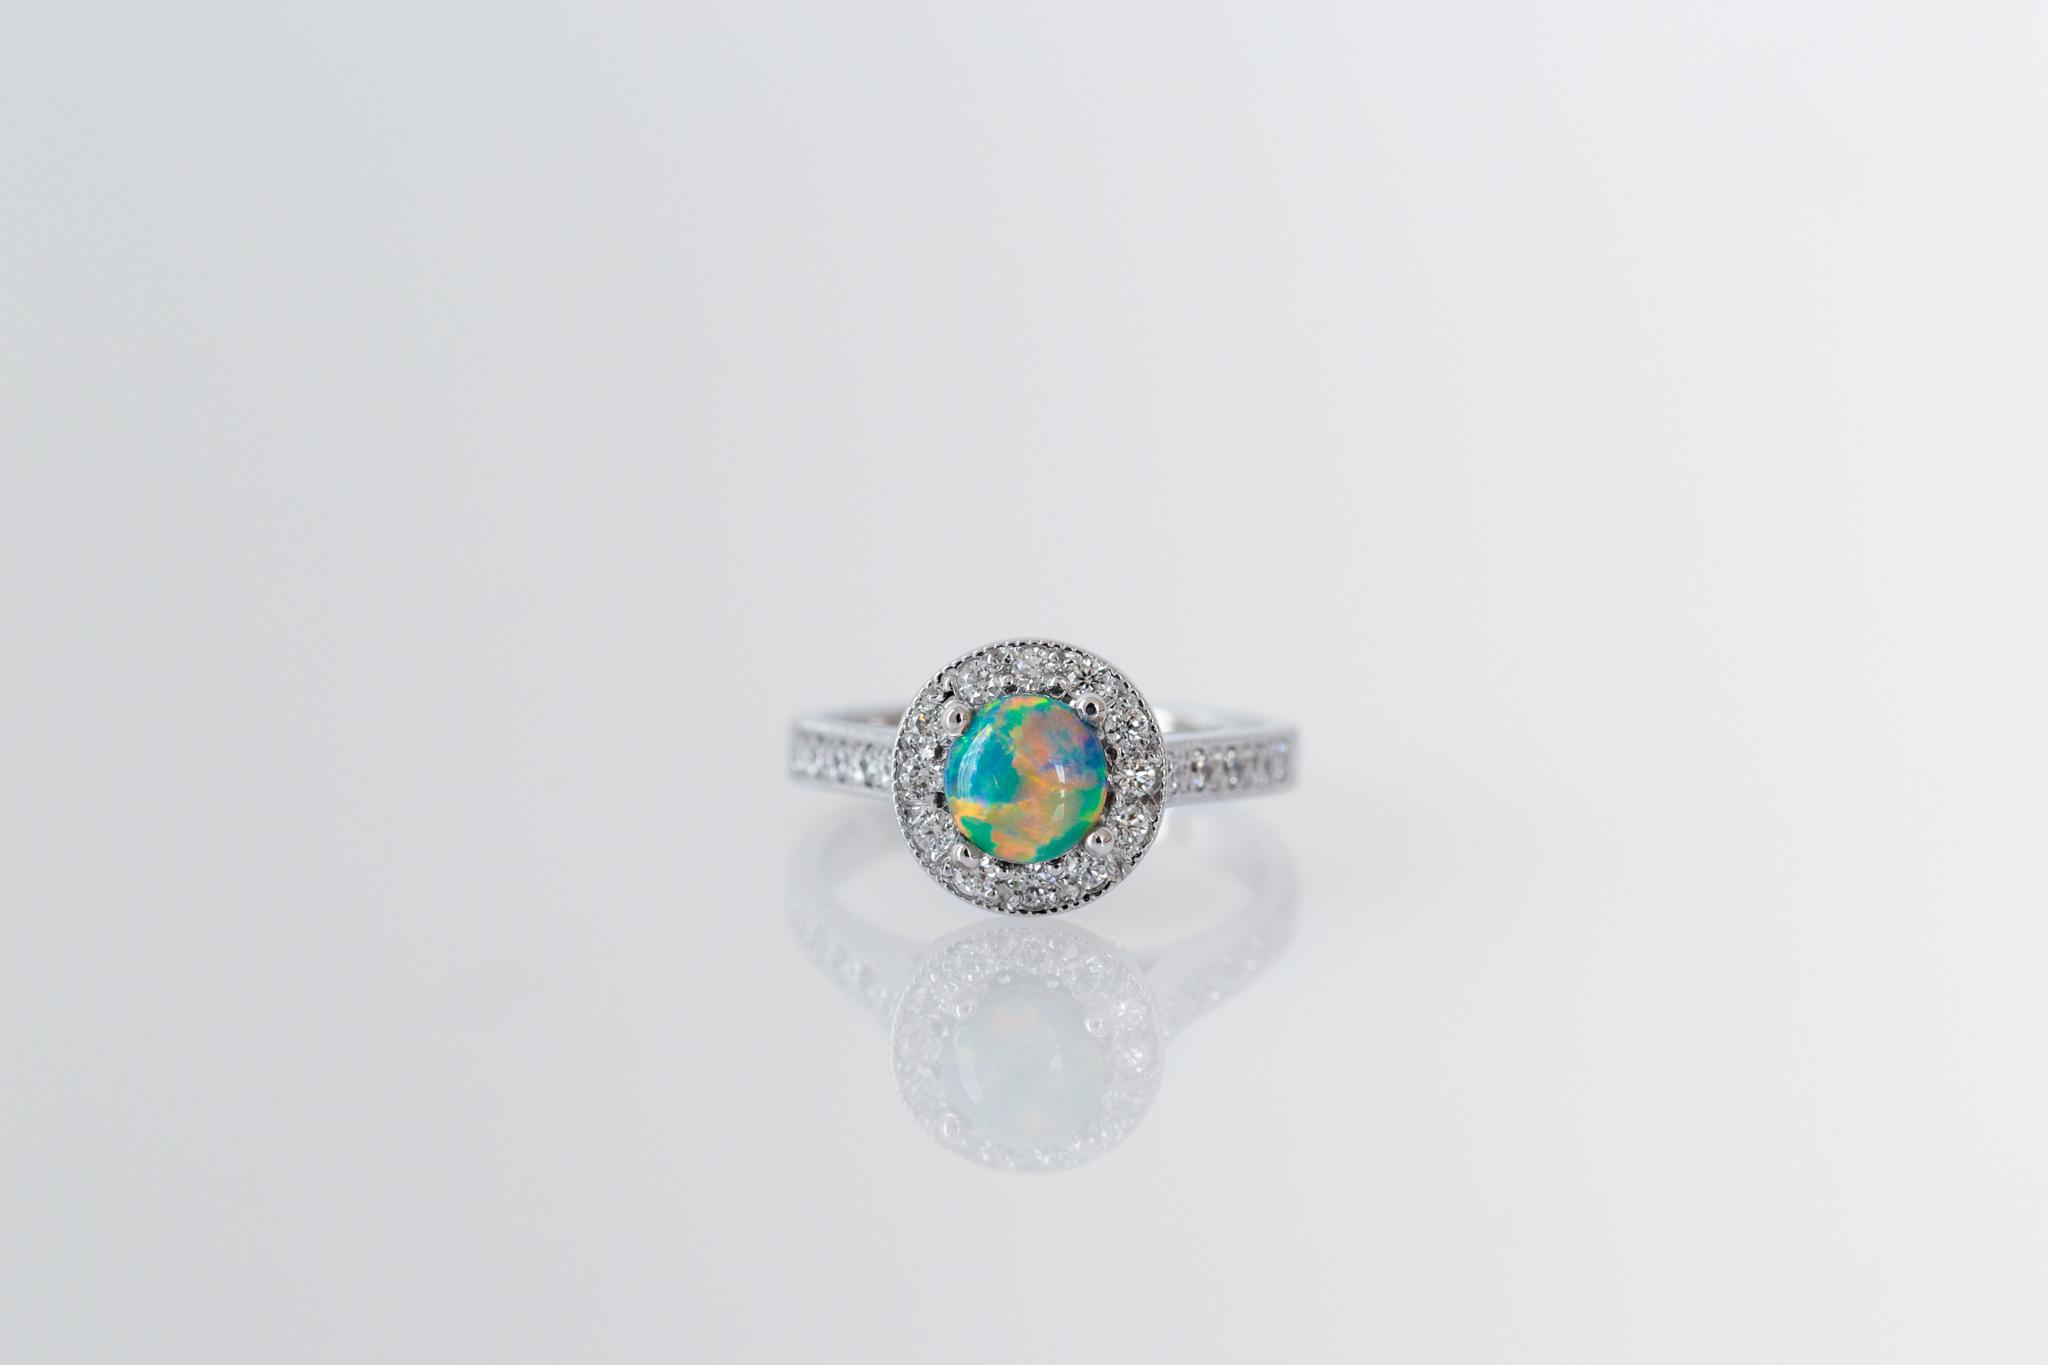 Black opal and diamond dress ring - Harlequin Jewellers